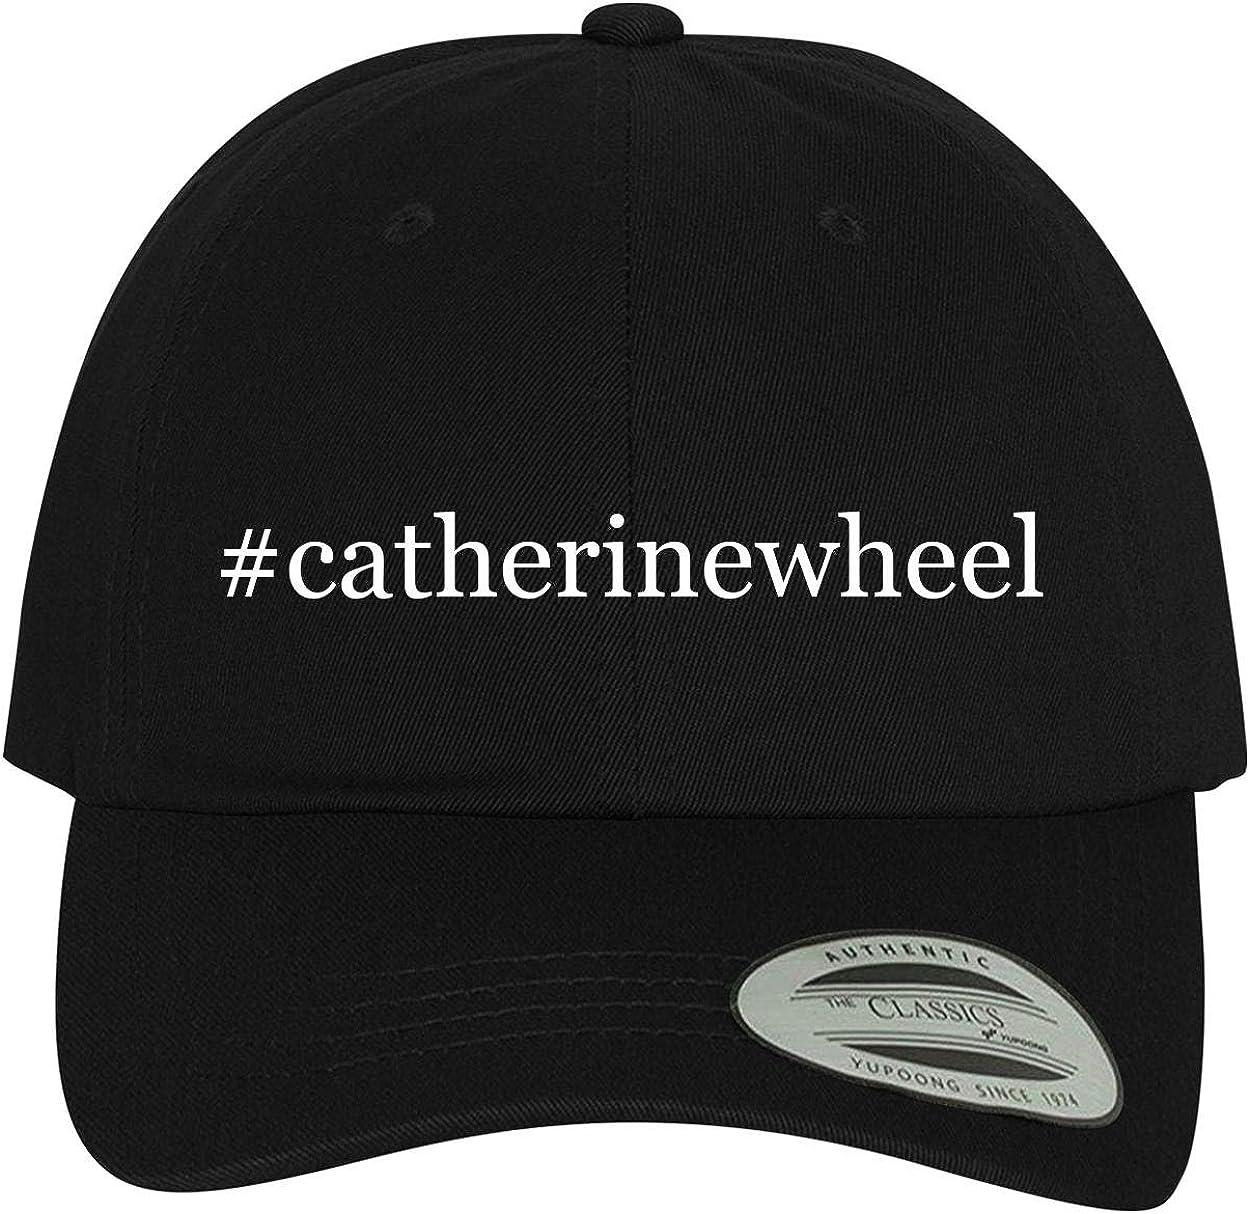 BH Cool Designs #CatherineWheel Comfortable Dad Hat Baseball Cap